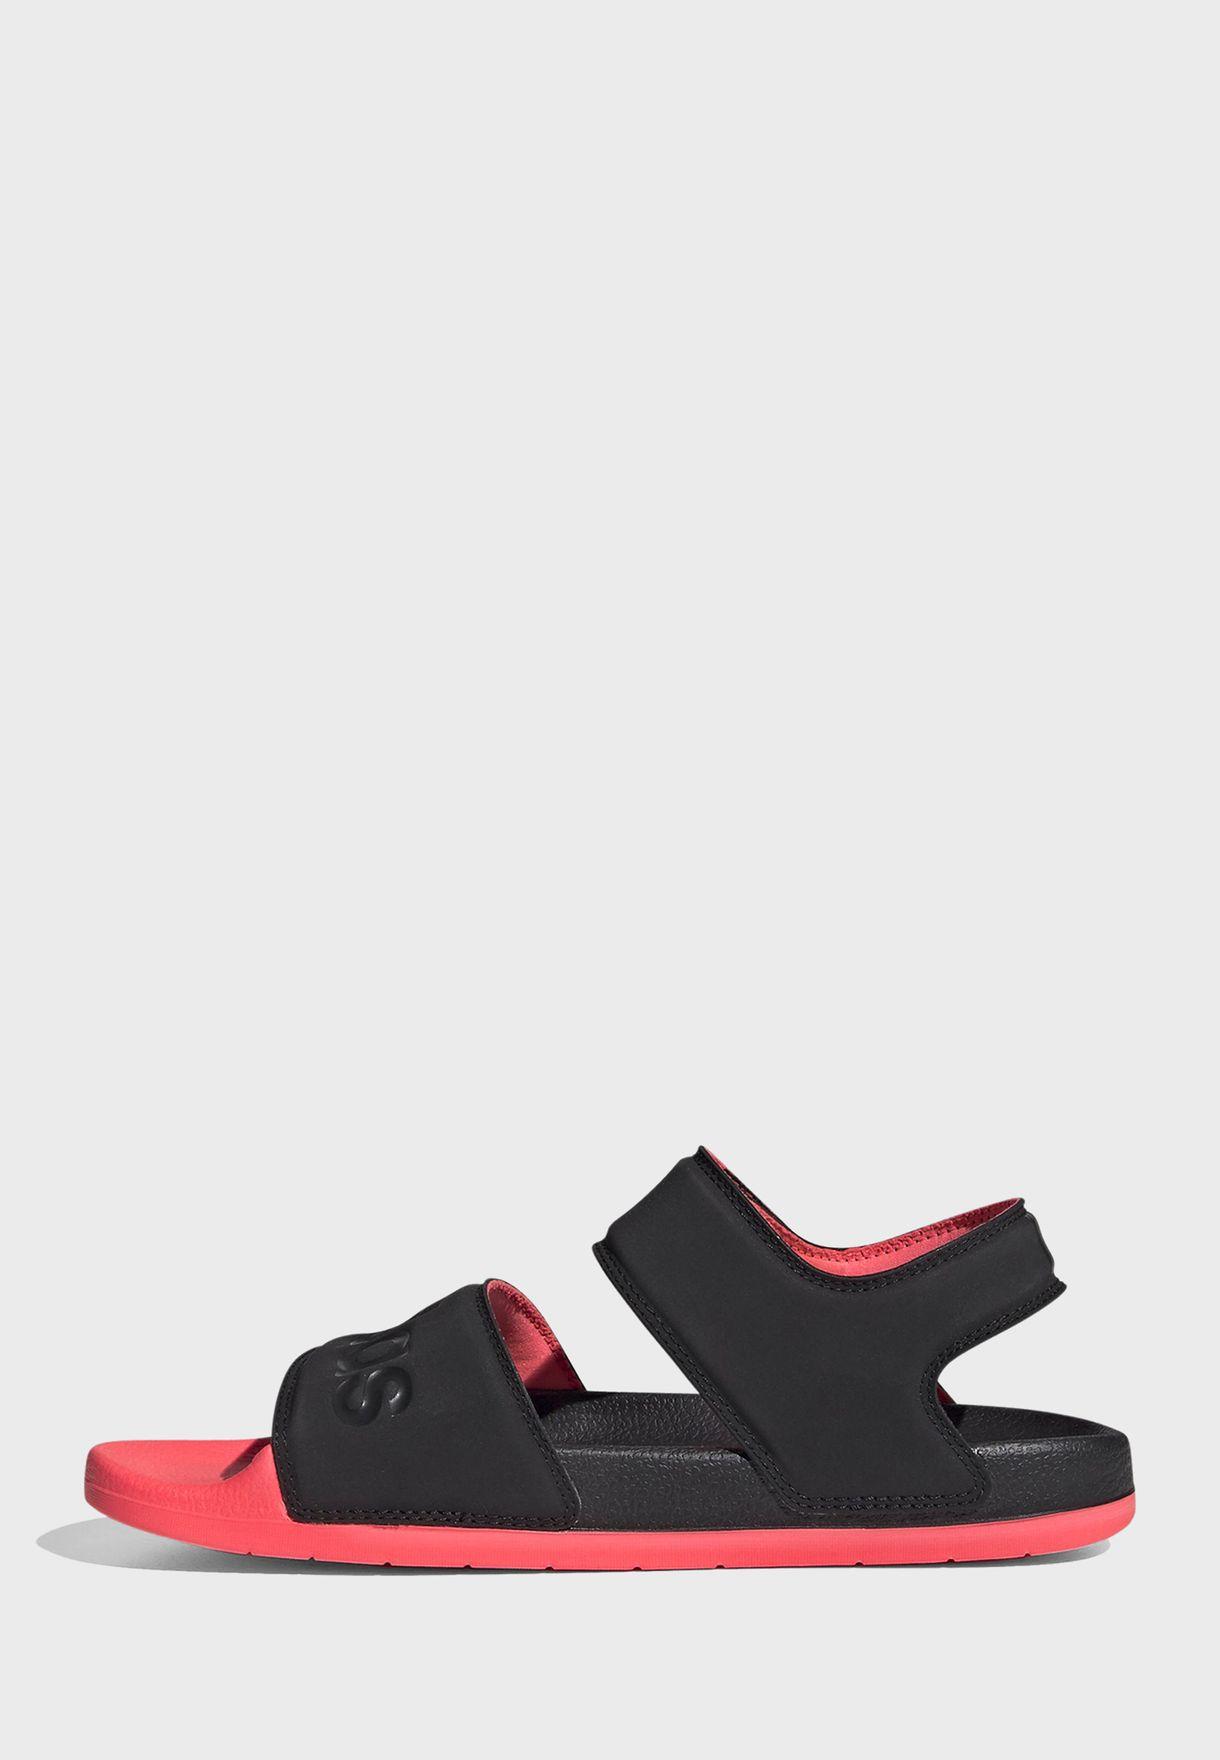 Adilette Sports Swim Women's Sandals